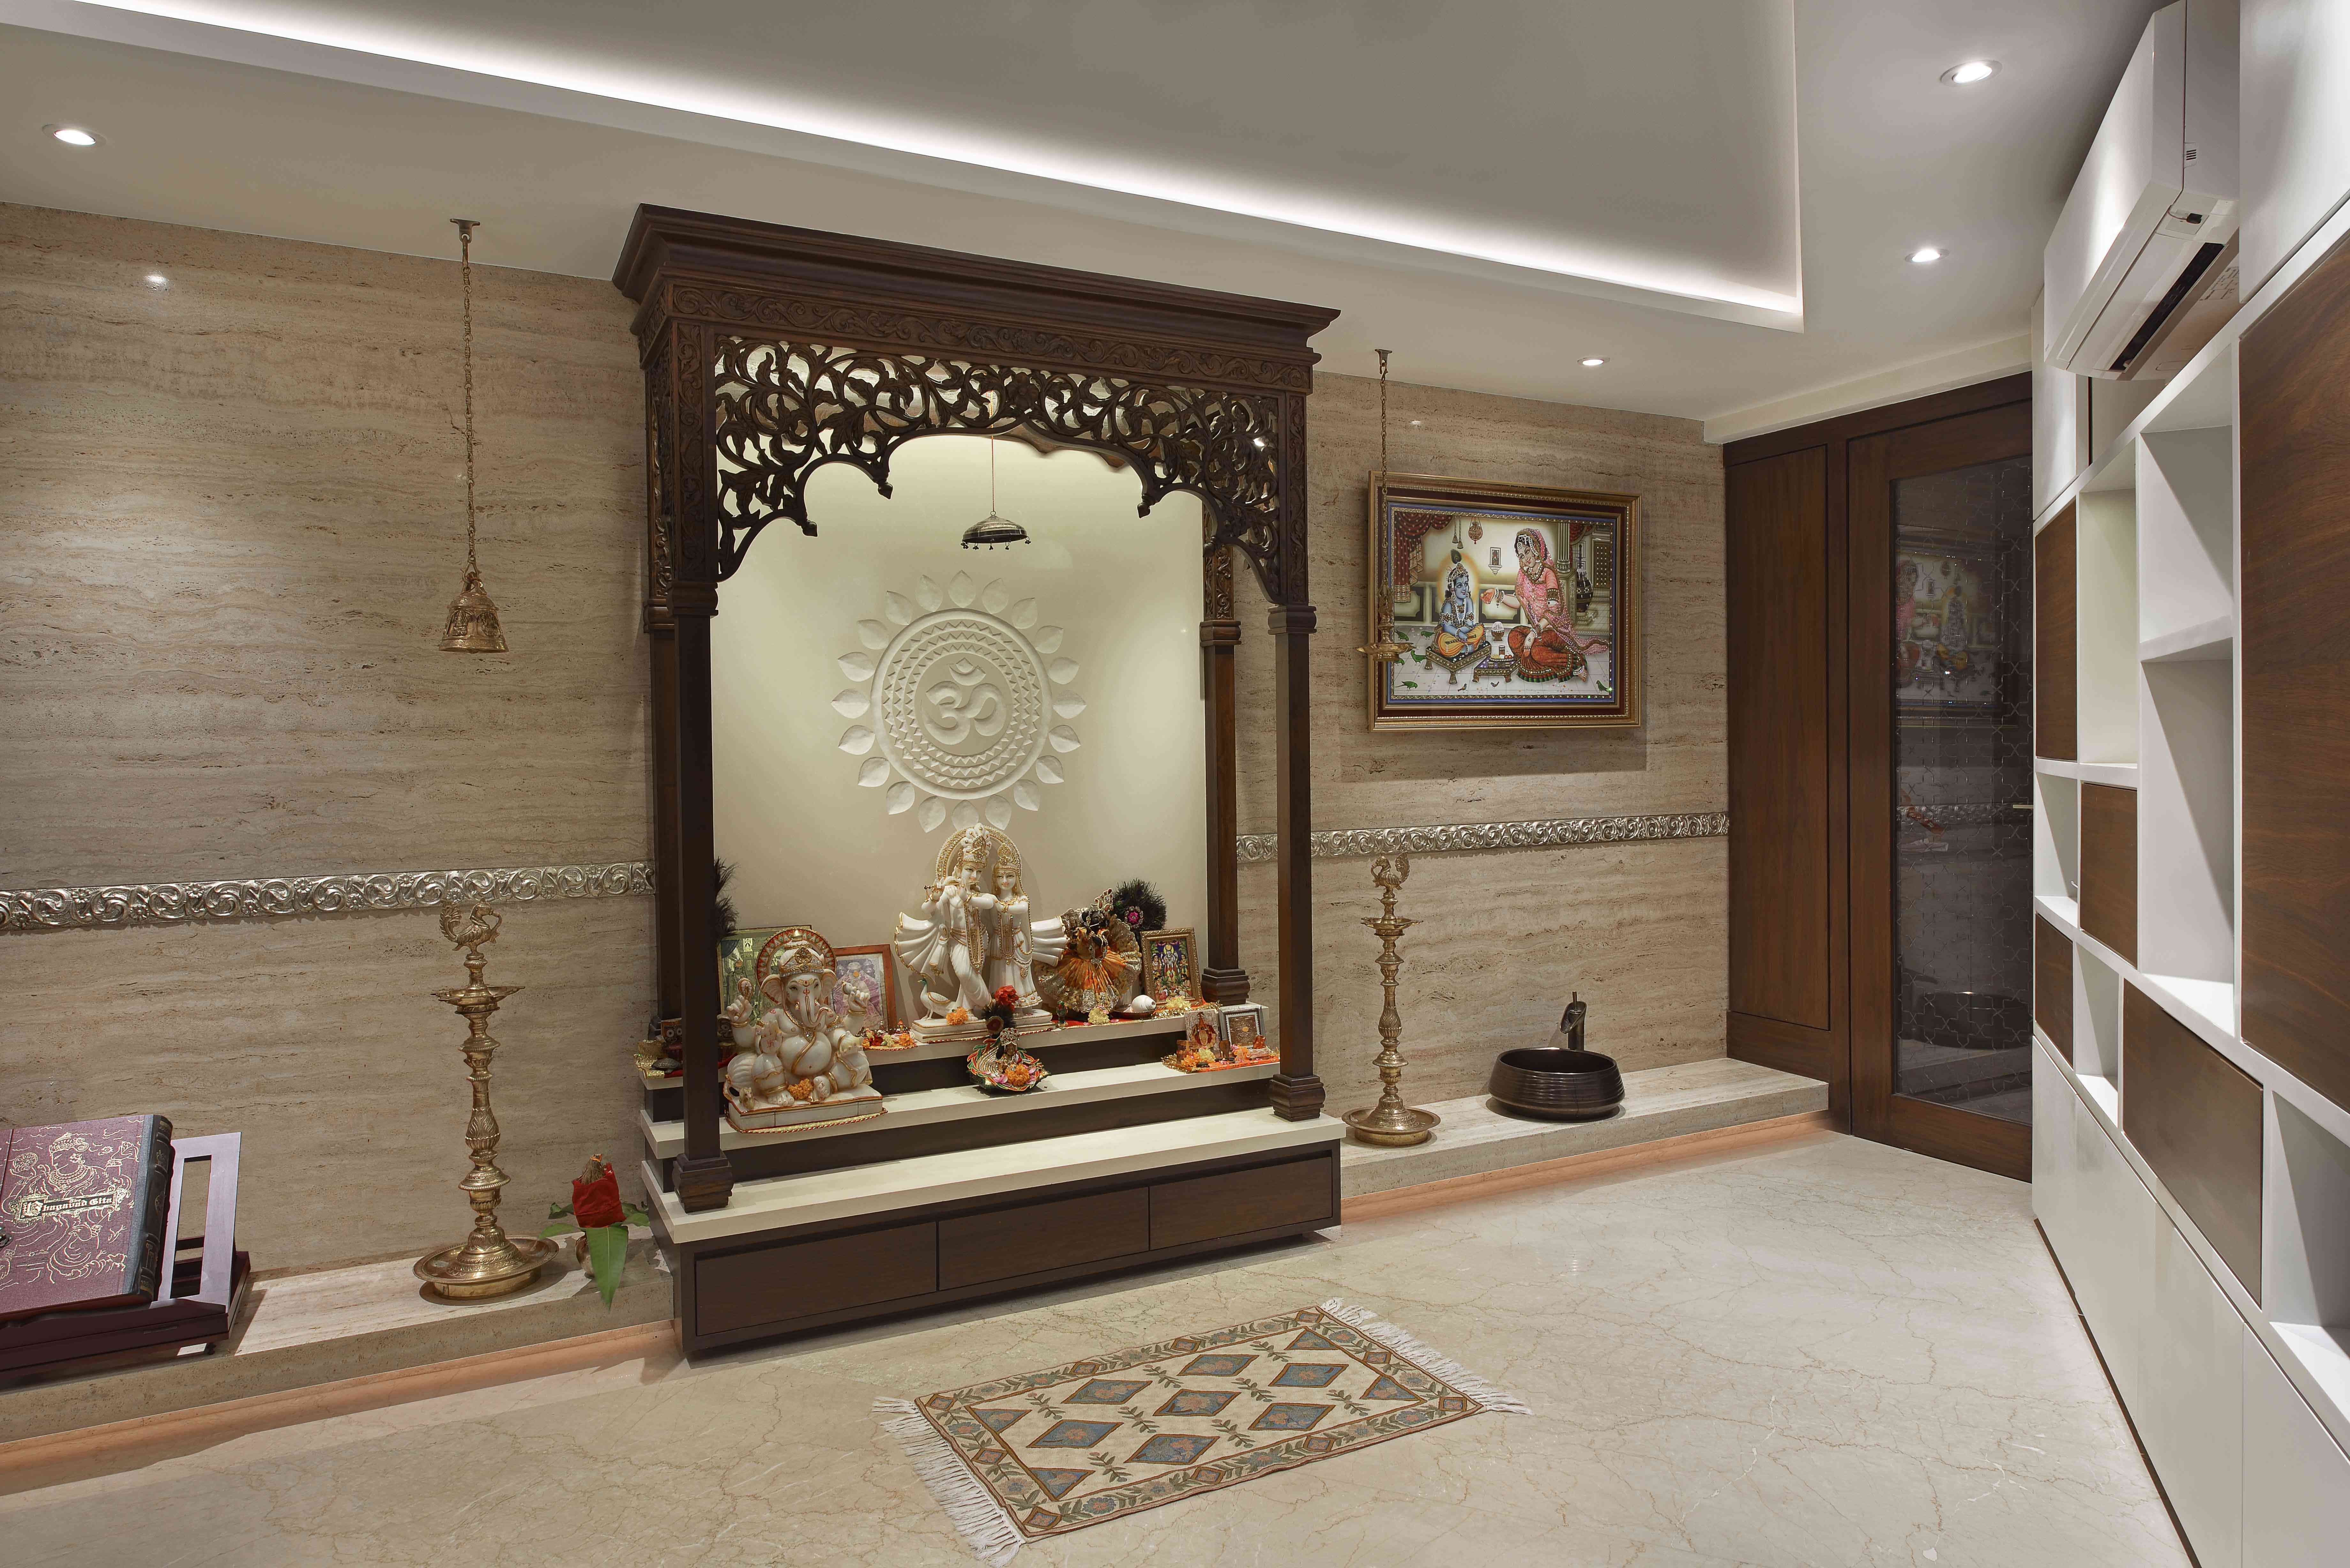 Mandir room design milind pai mandir pinterest pai room and